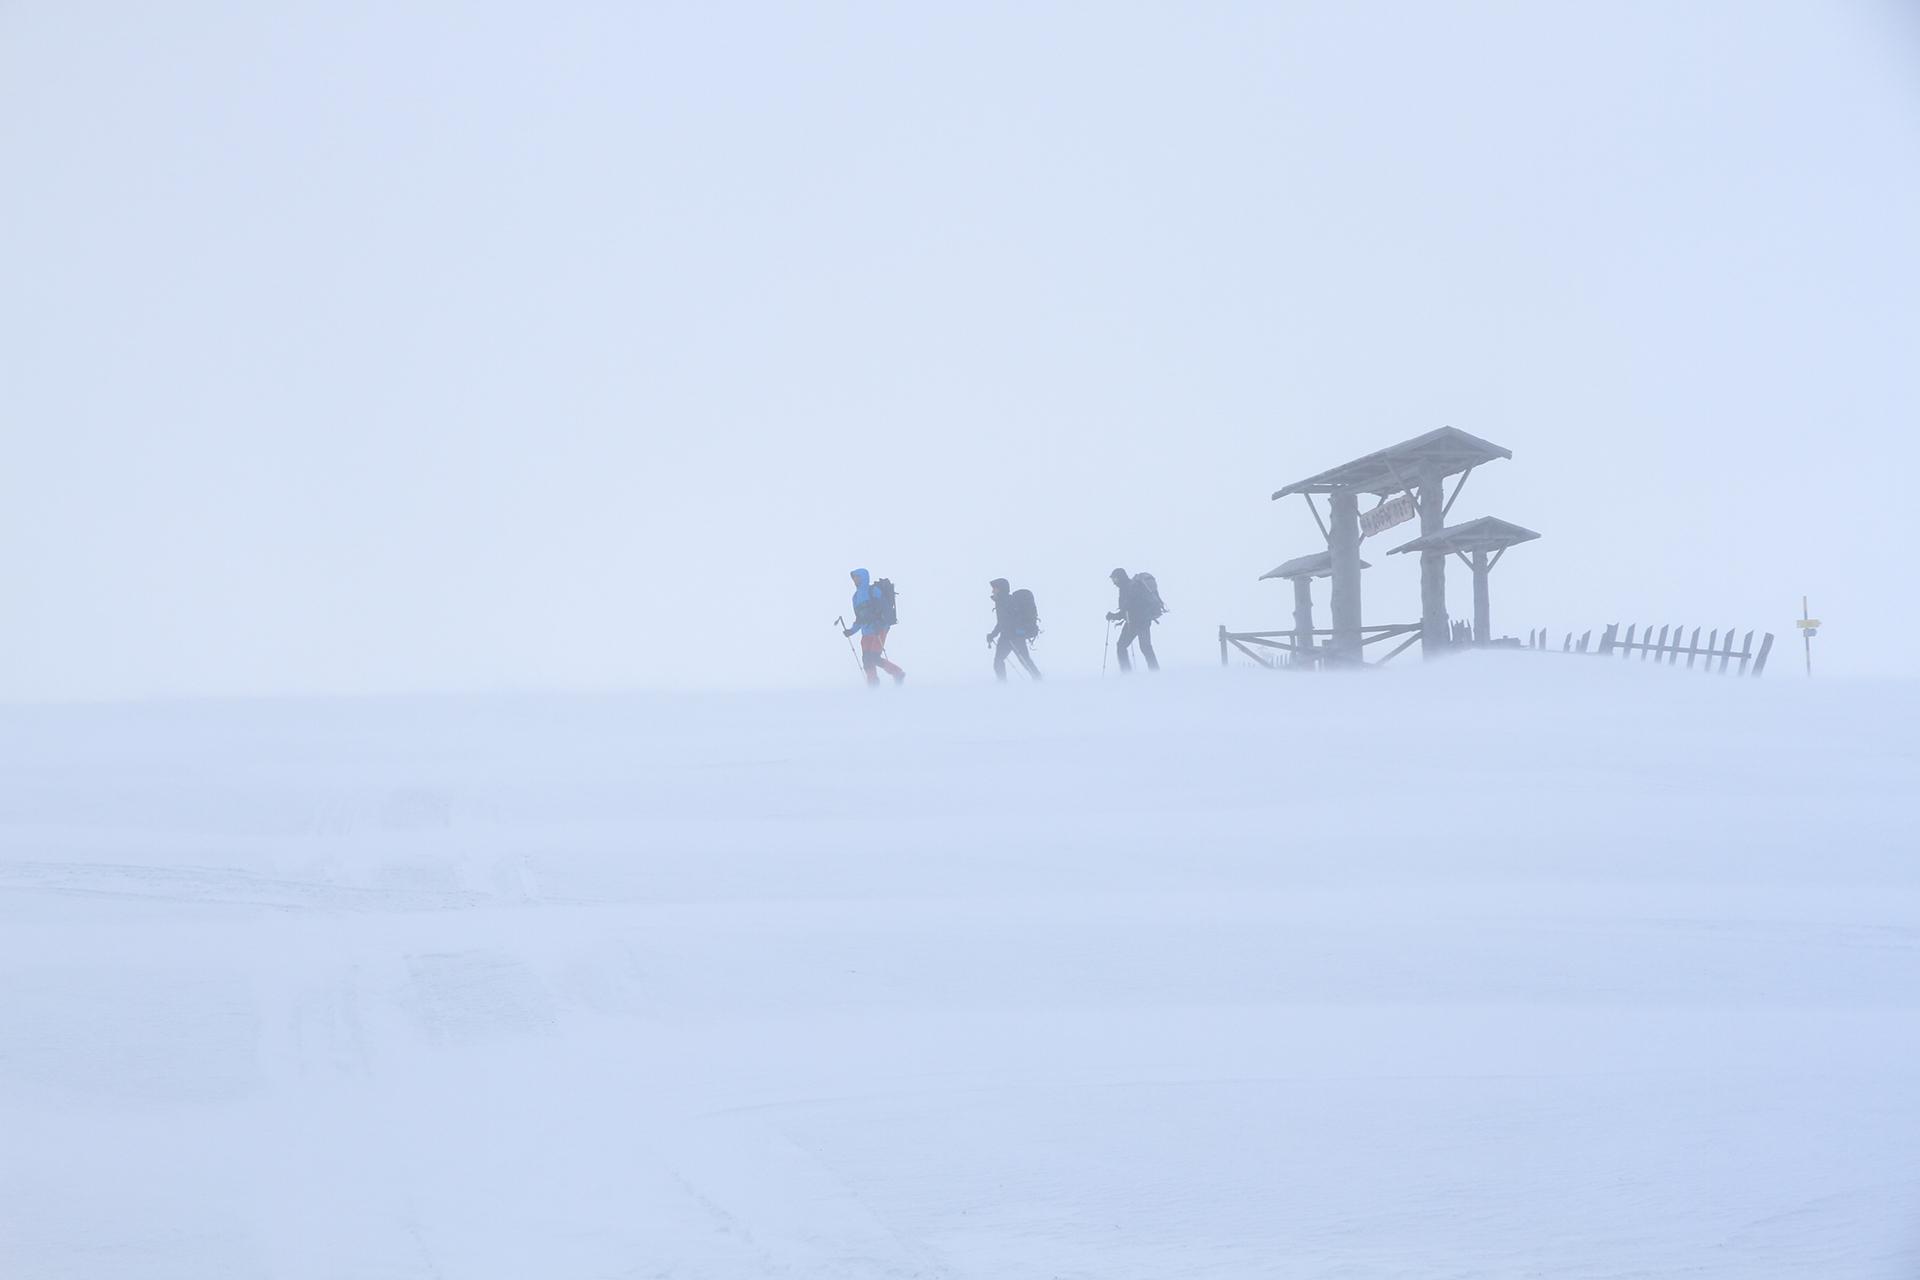 Зима от емилиян евдокимов - evdokimov_emo